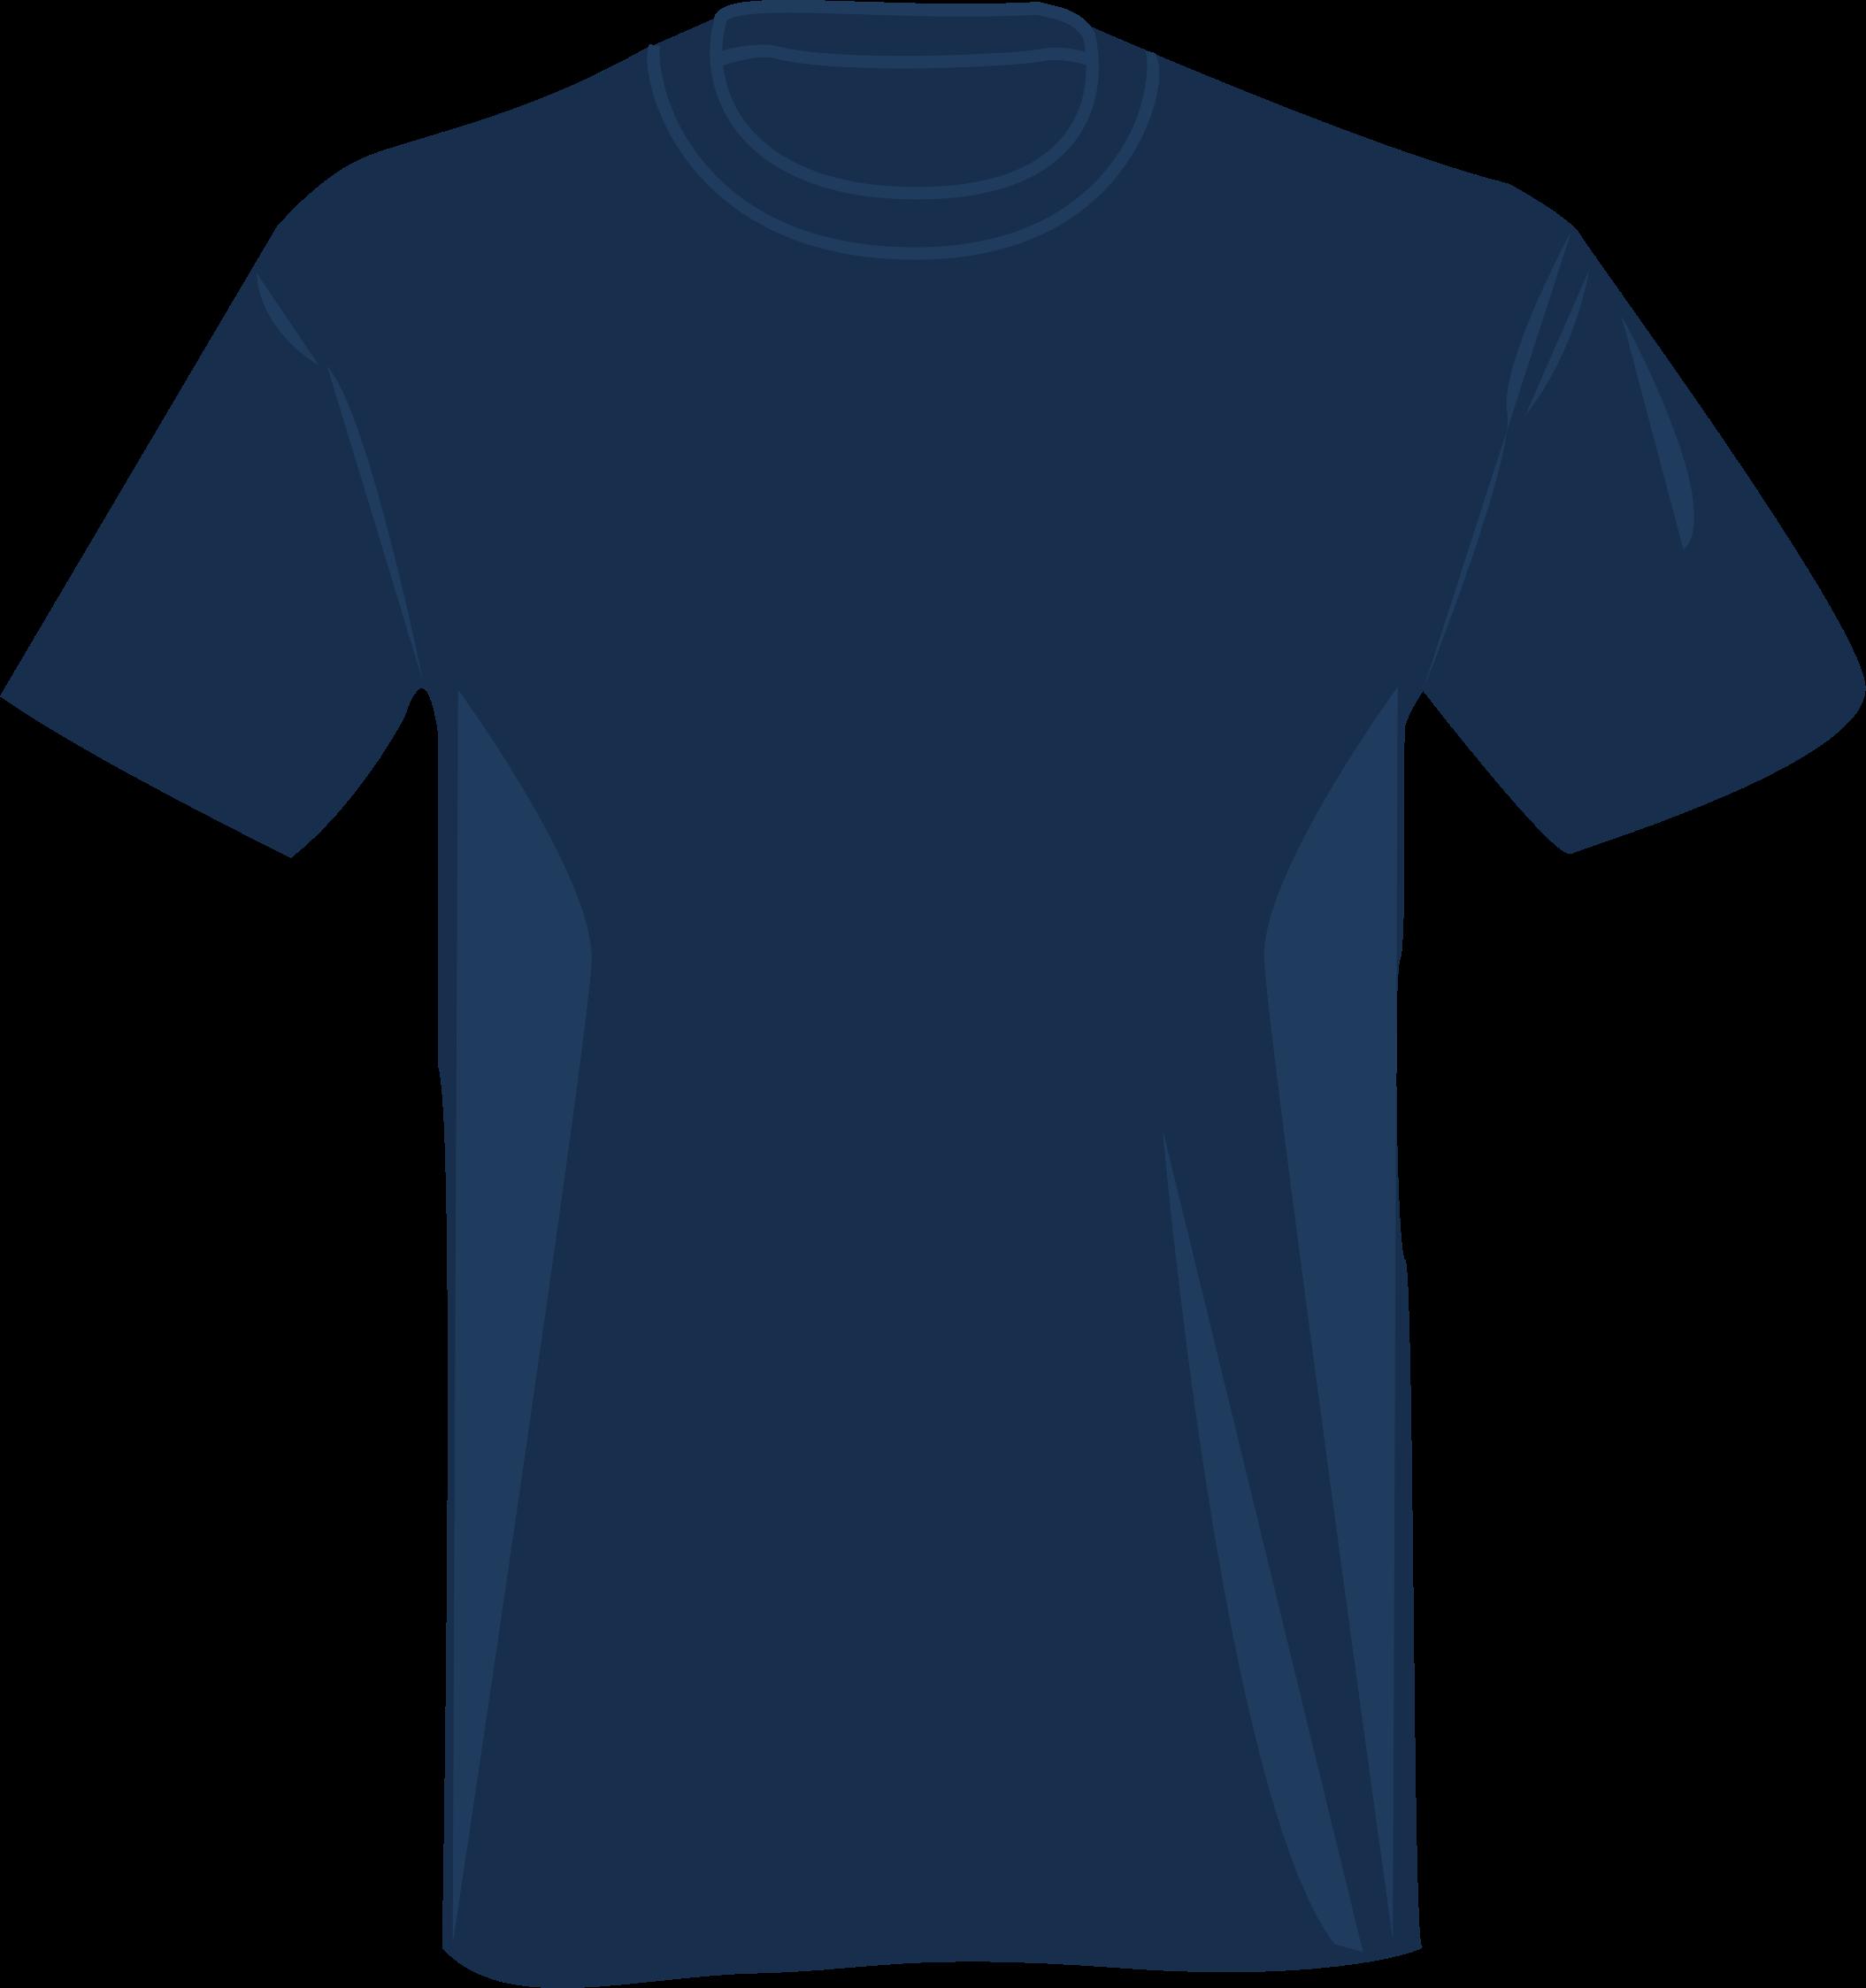 jpg free stock Blue t shirt big. Gold clipart tshirt